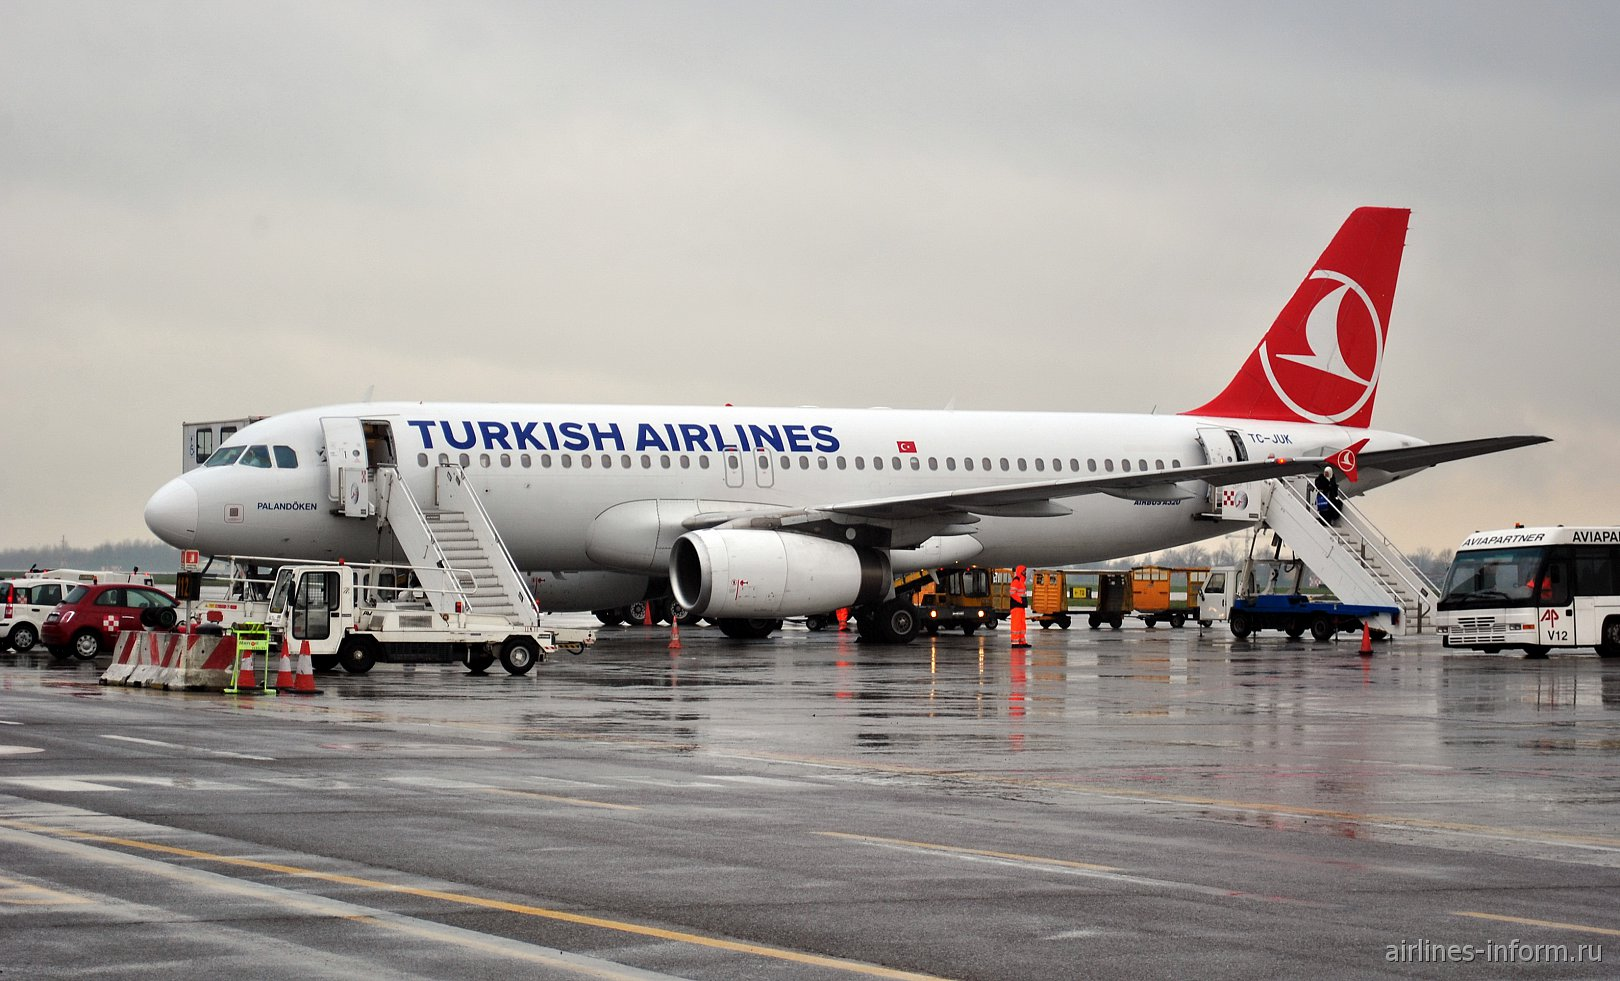 Widen Your World: открывая Америку с лучшей авиакомпанией Европы. Стамбул Ататюрк (IST) - Болонья (BLQ) на Airbus A320 Turkish Airlines